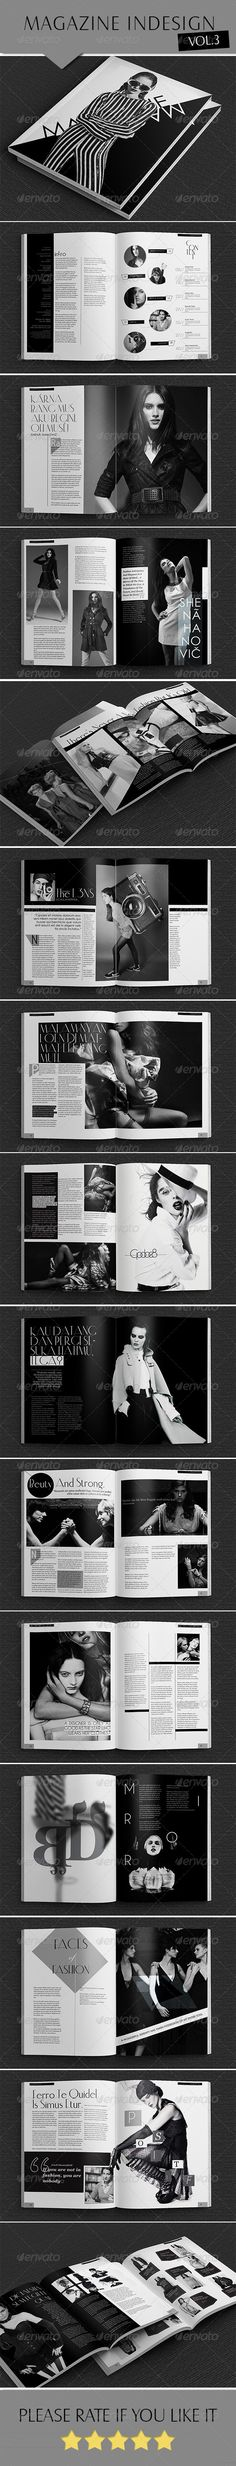 Indesign B/W Magazine - Magazines Print Templates